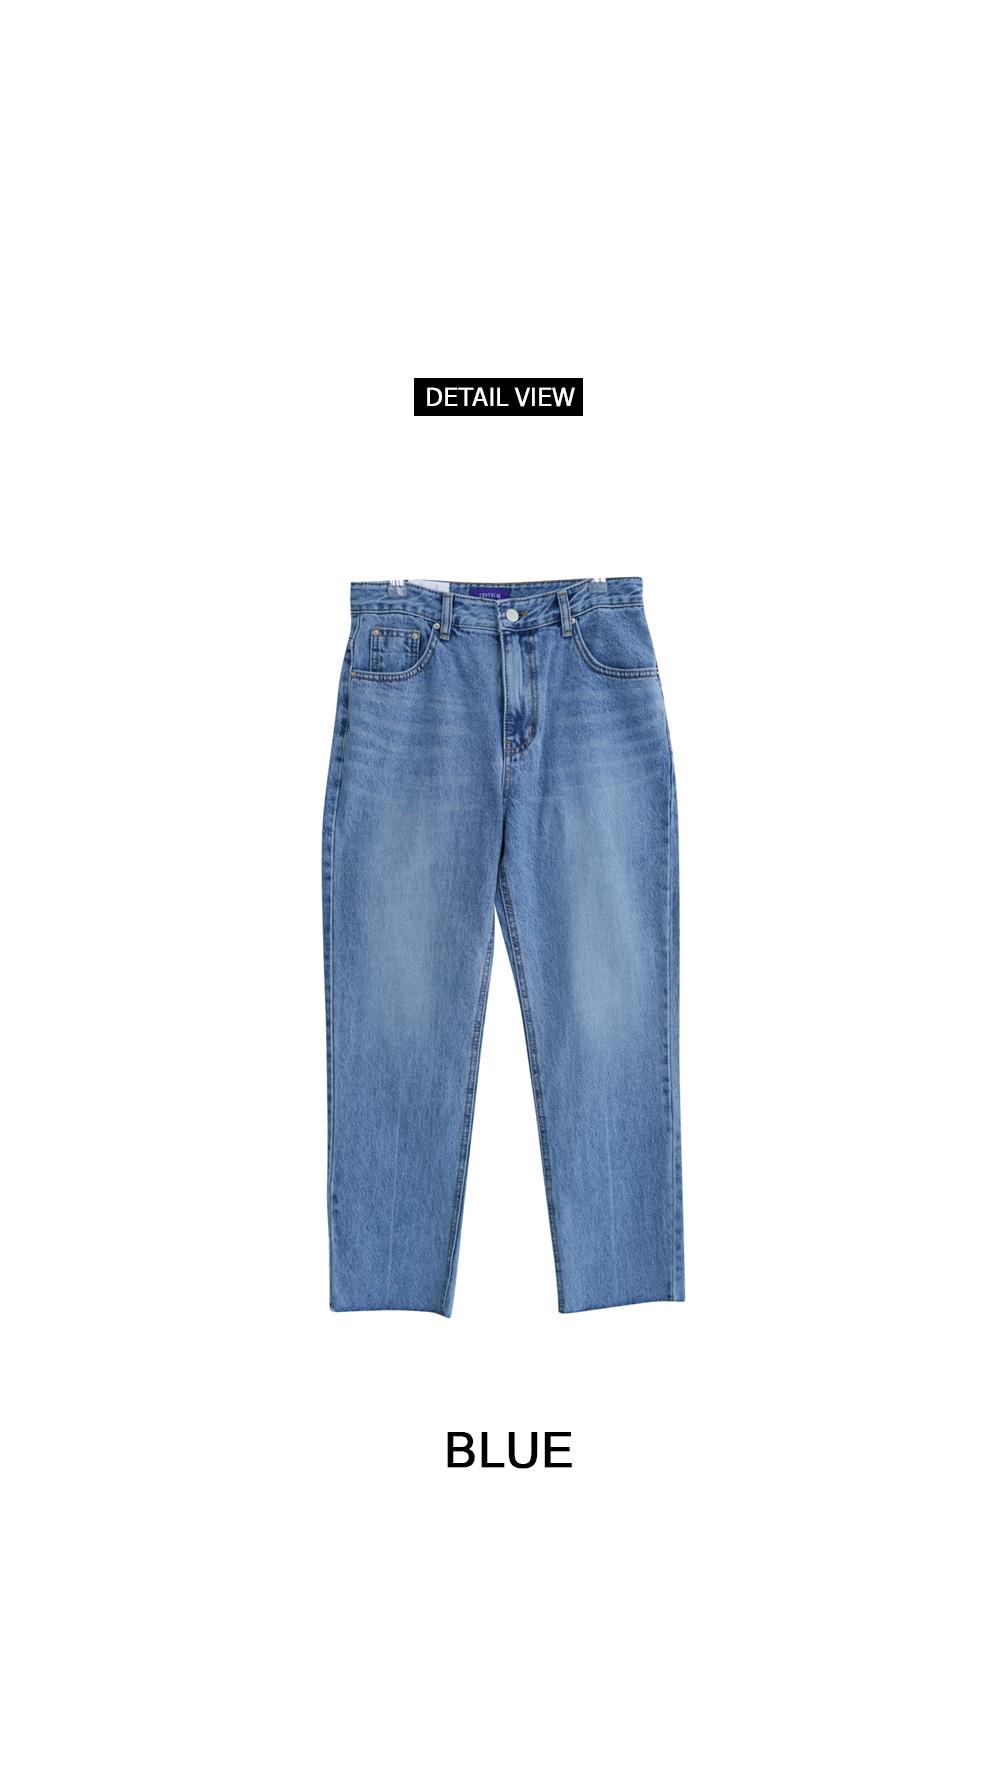 Regigi Date Pants